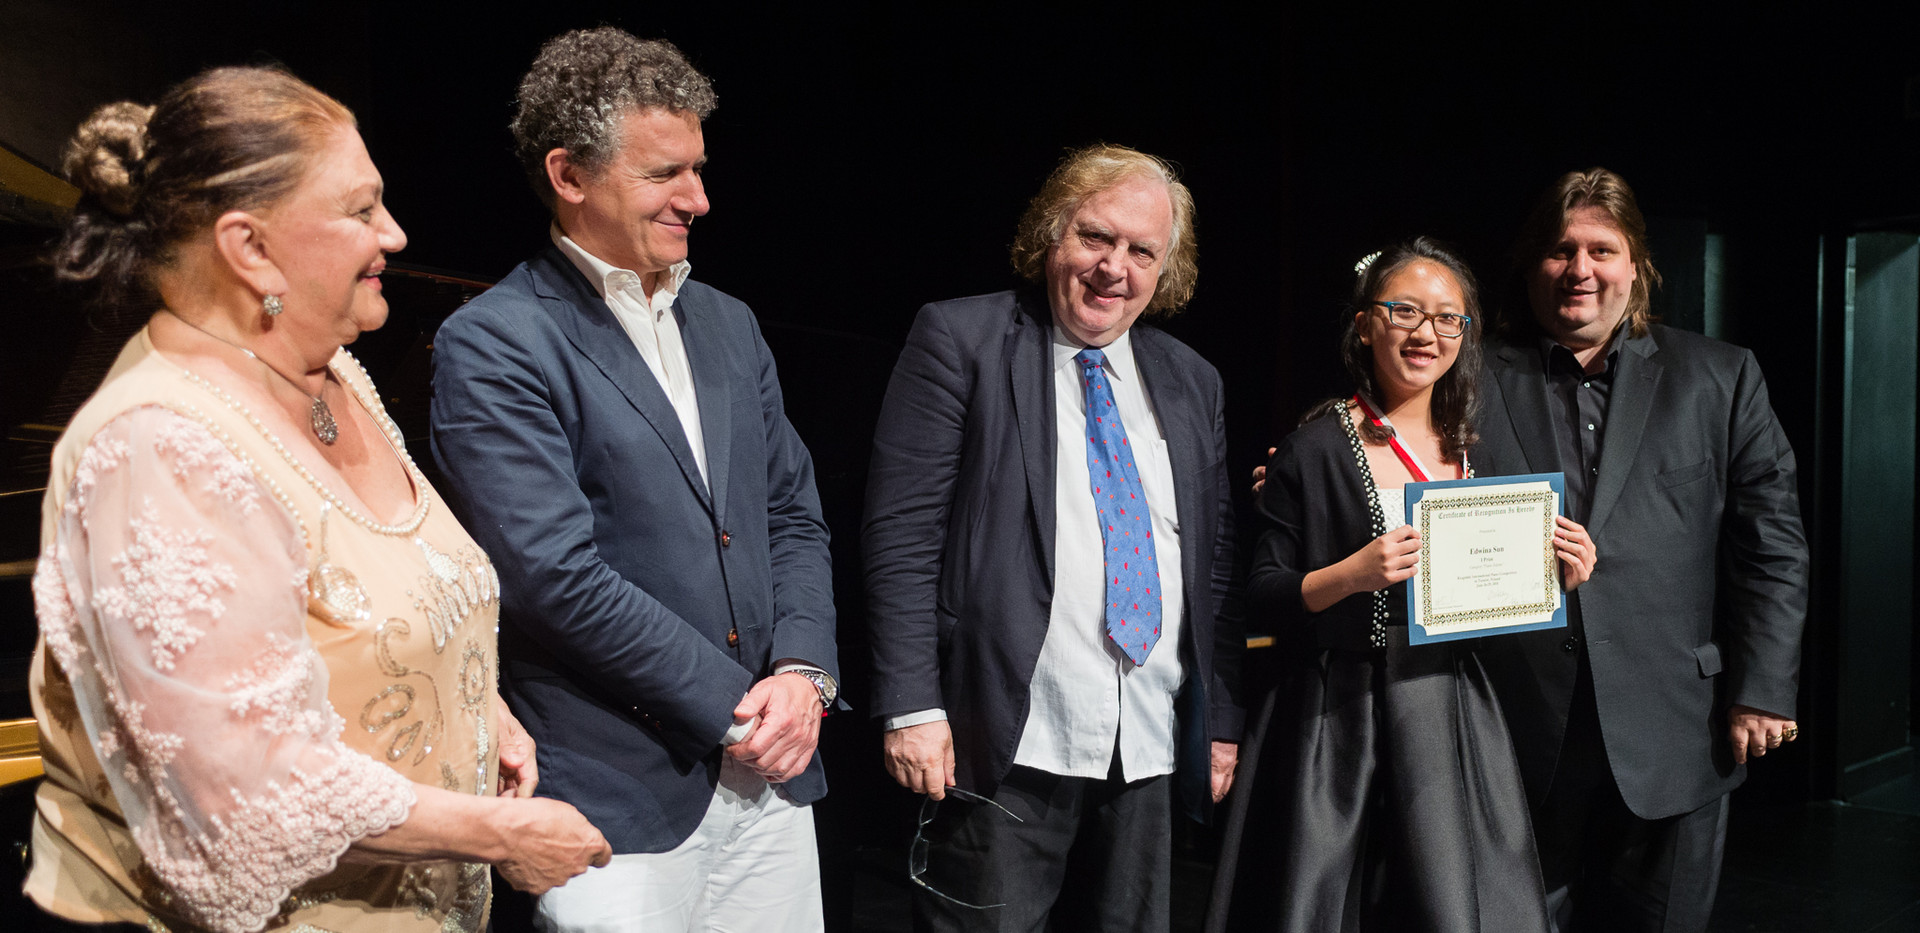 "Oxana Yablonskaya, Alexis Soriano, Einar Steen-Nøkleberg, Edwina Sun, USA - I nagroda, Kategoria ""Młode Talenty"""